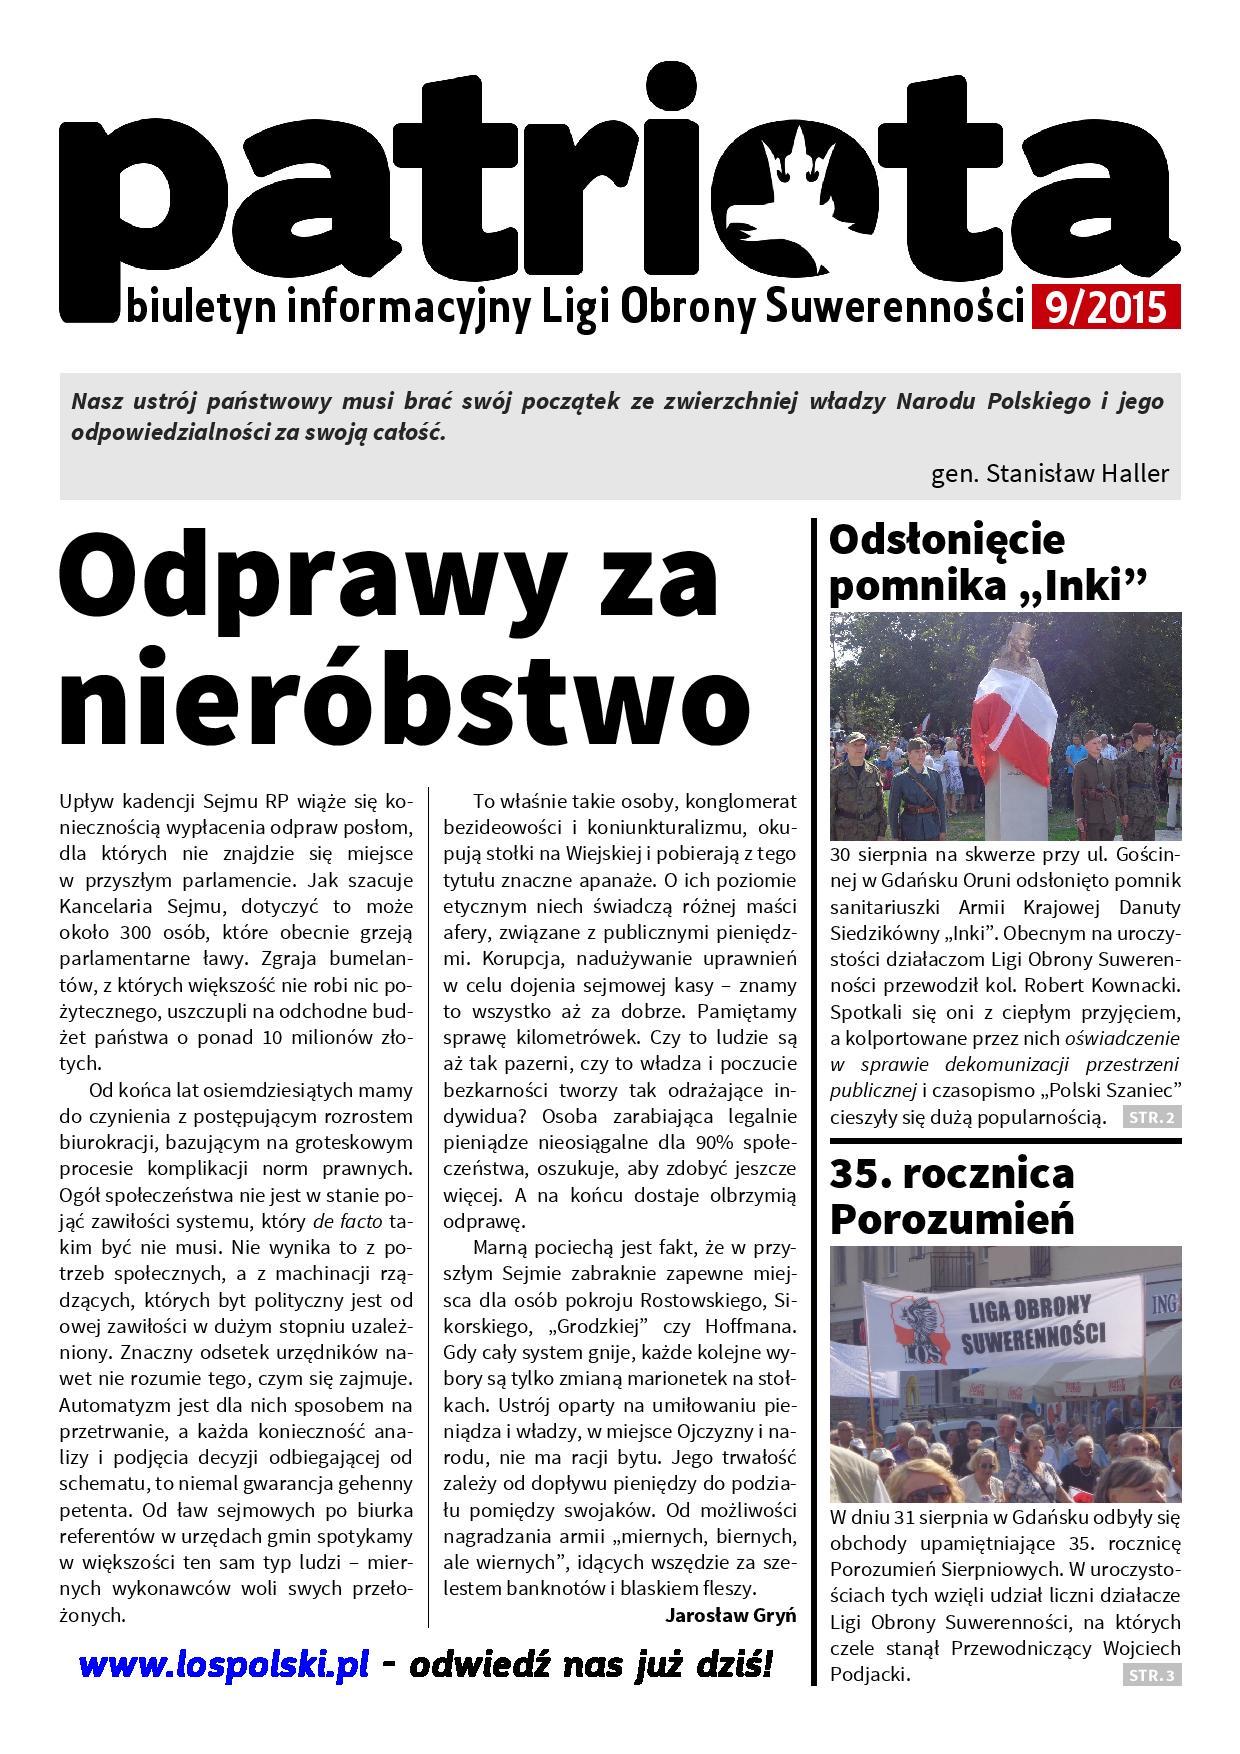 Patriota 9/2015